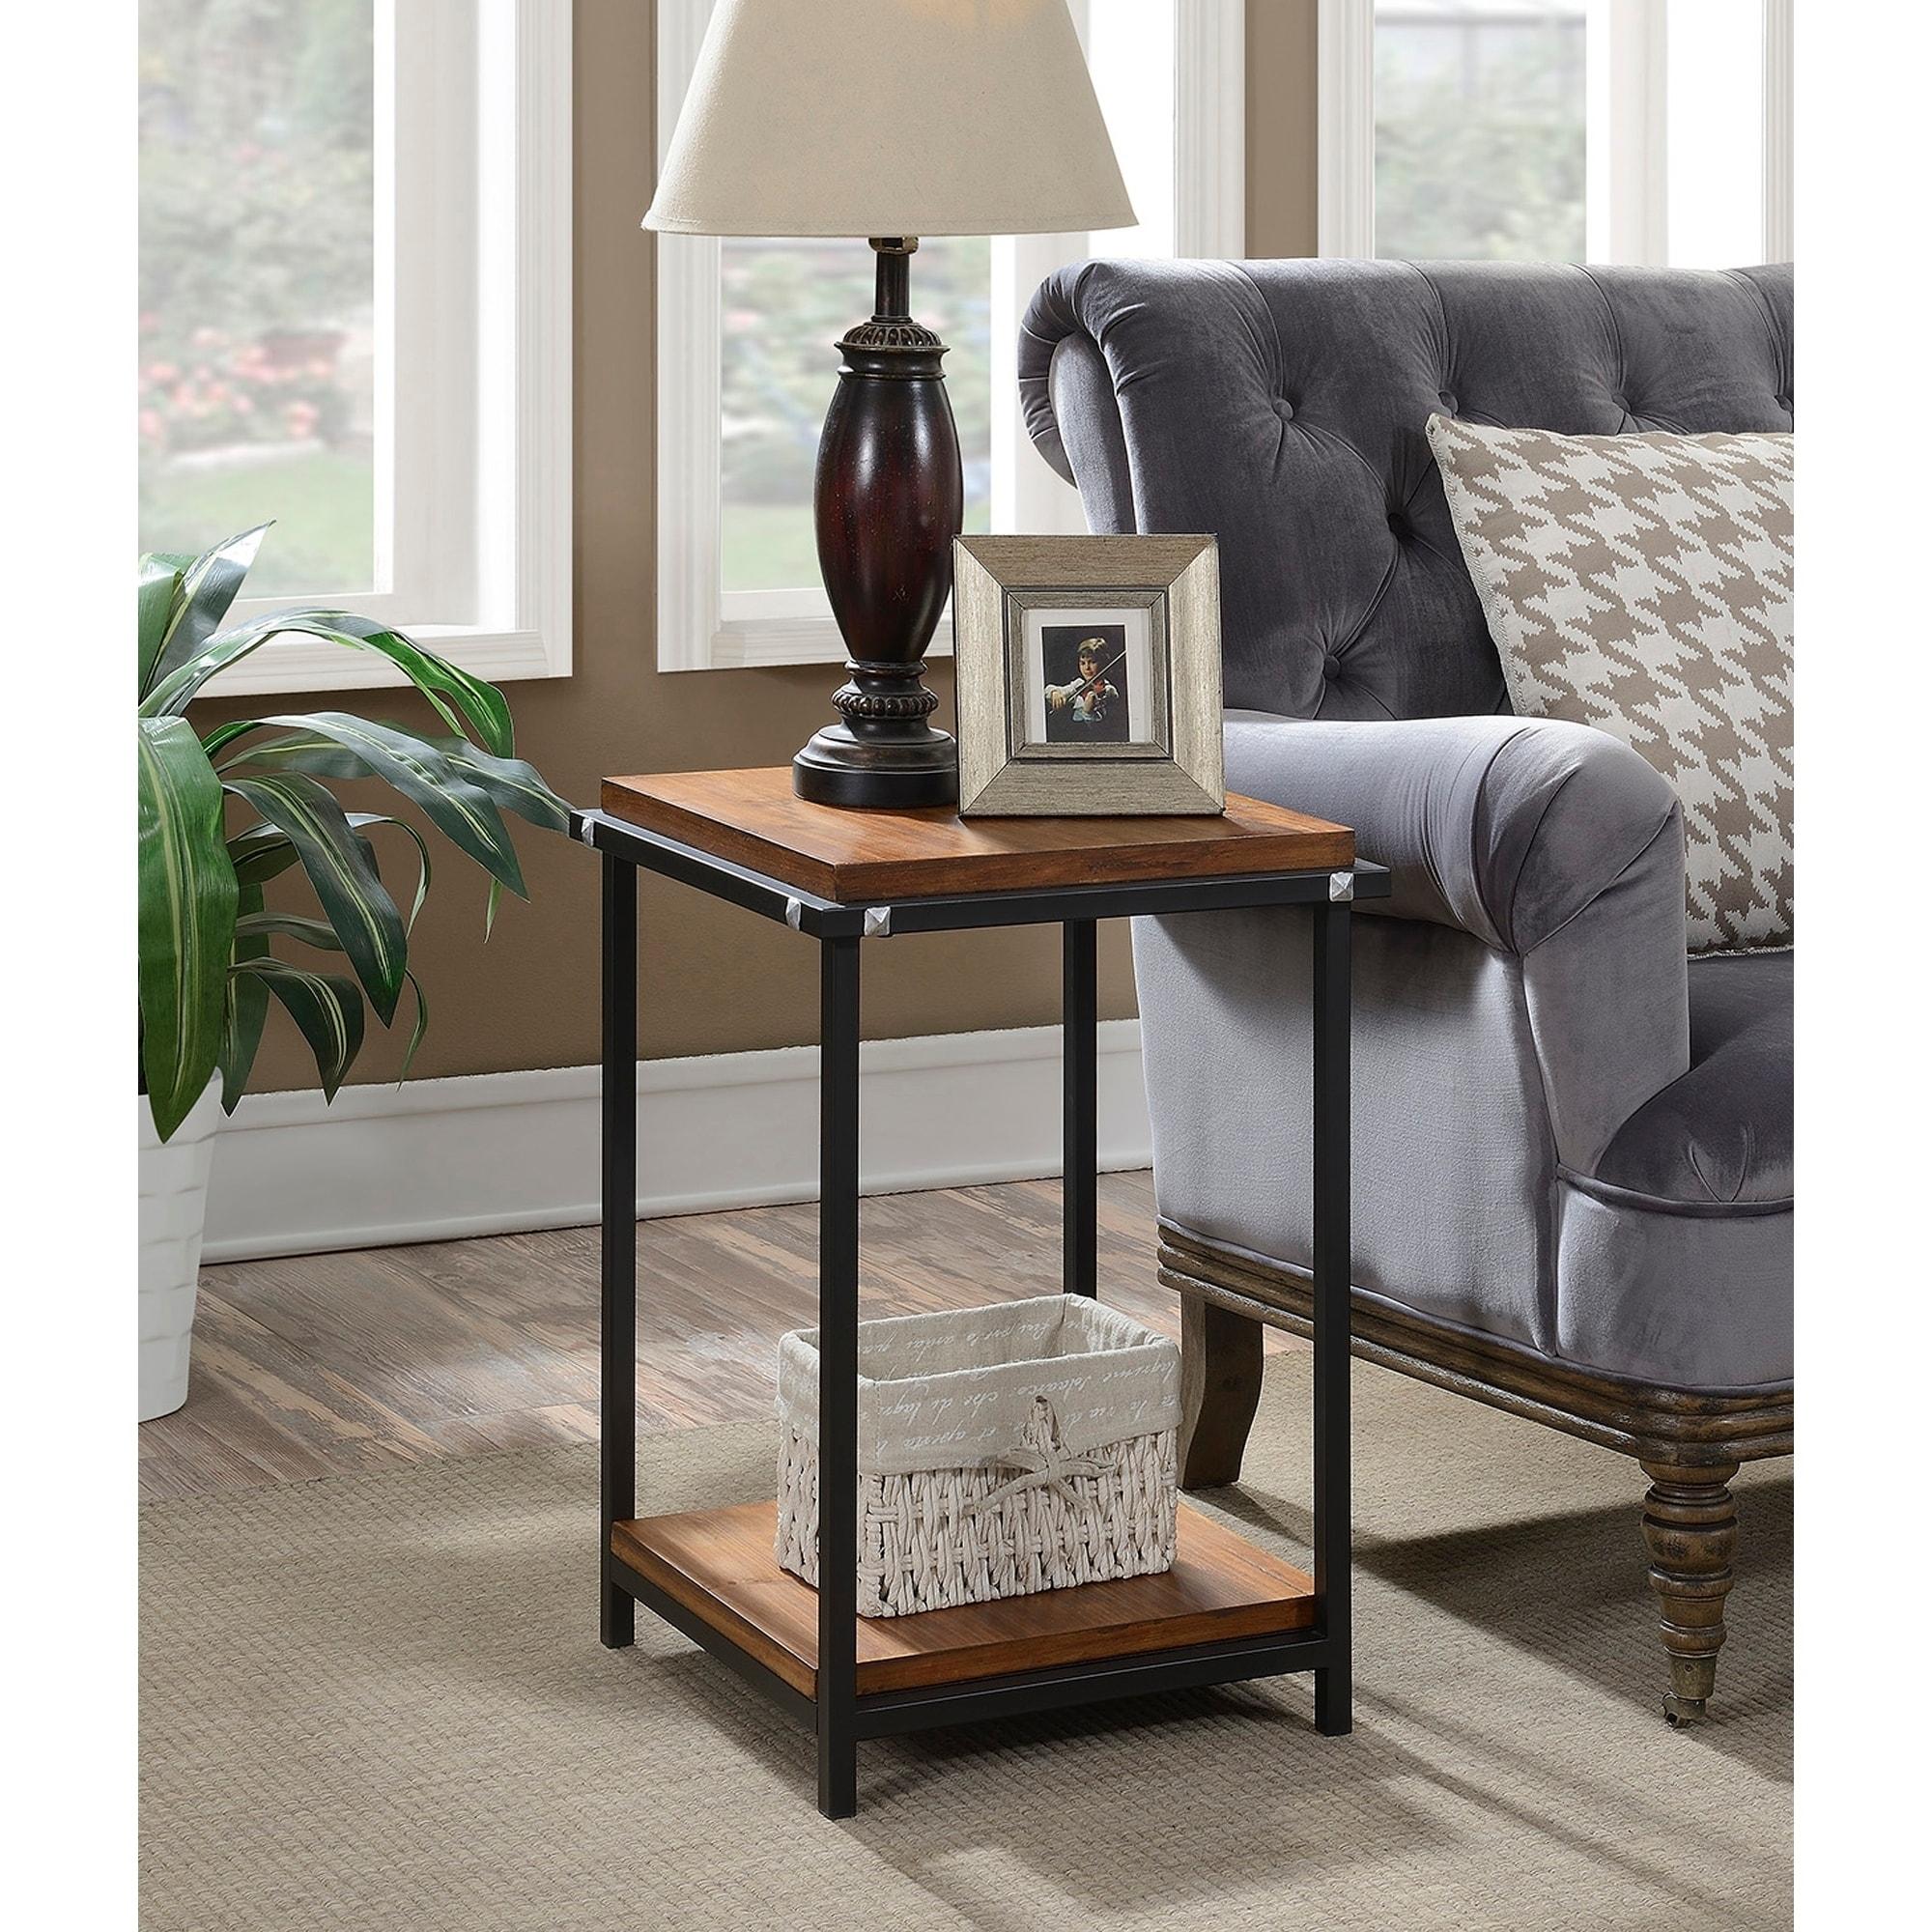 Industrial End Table Square Wooden Tabletop Lower Shelf Storage Metal Frame